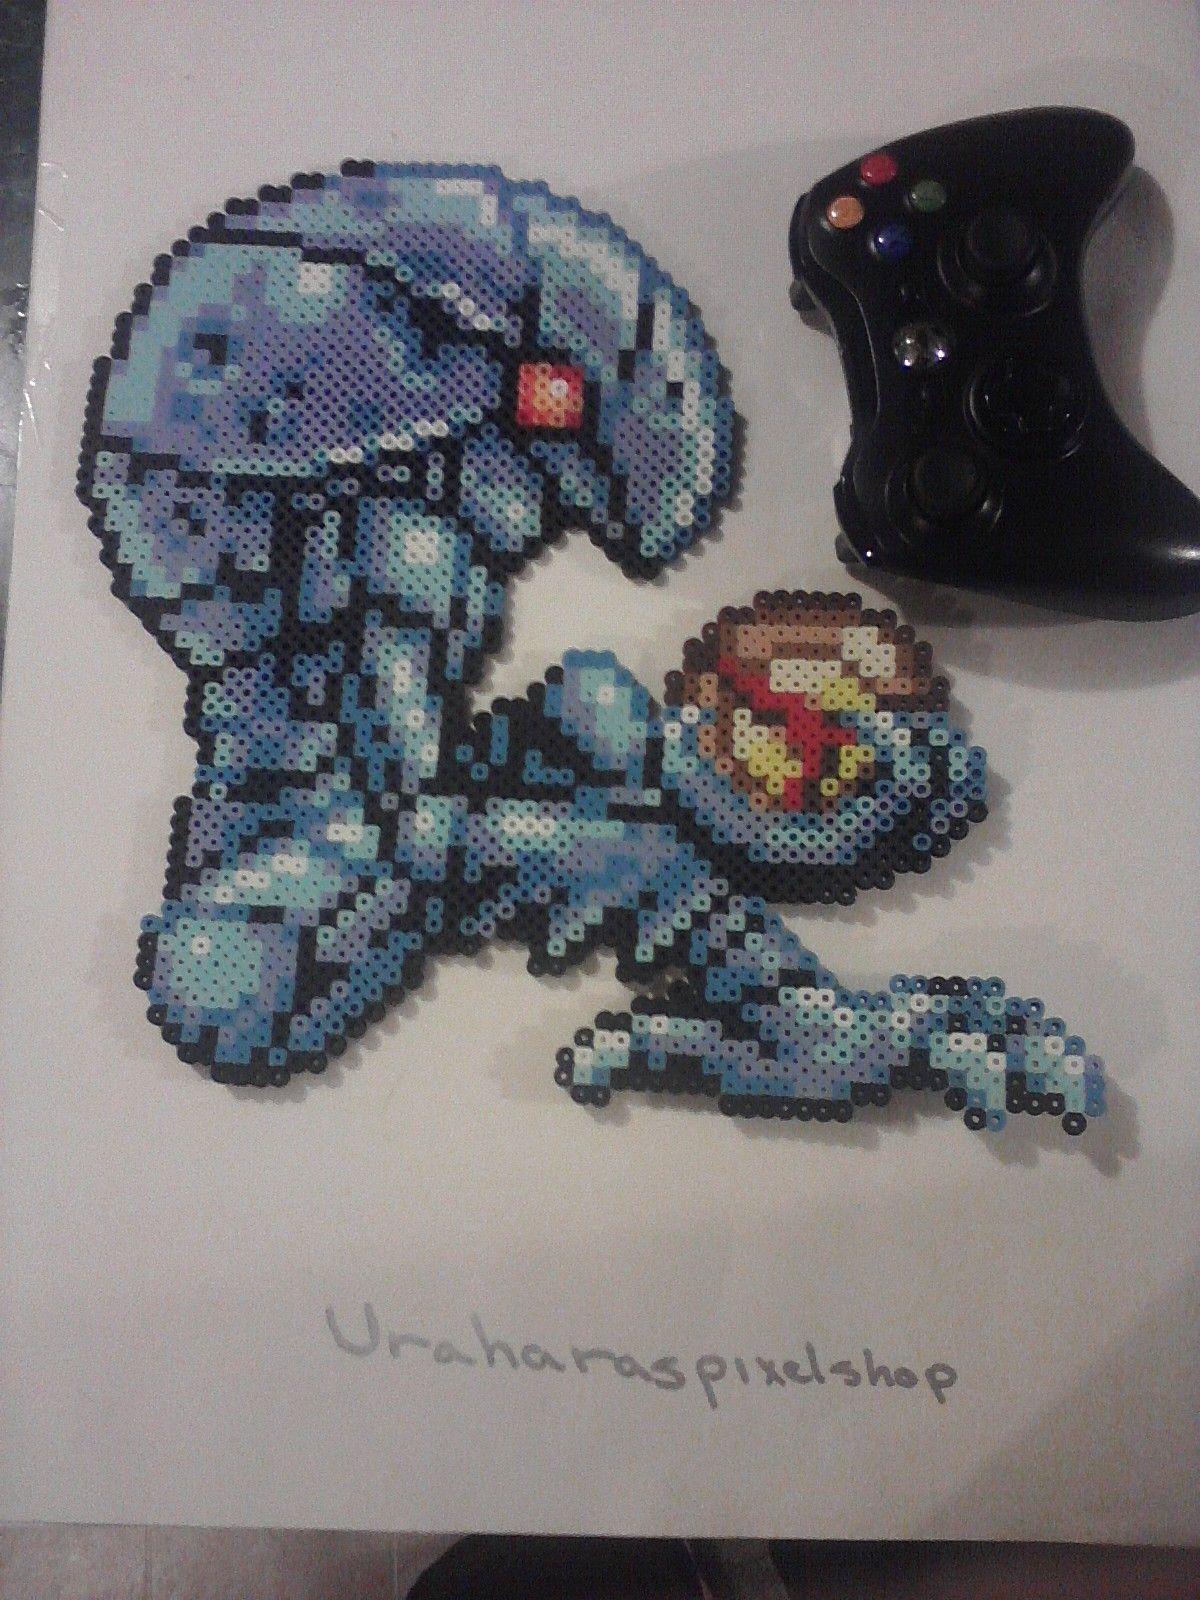 Steve sowa uraharapixel on pinterest